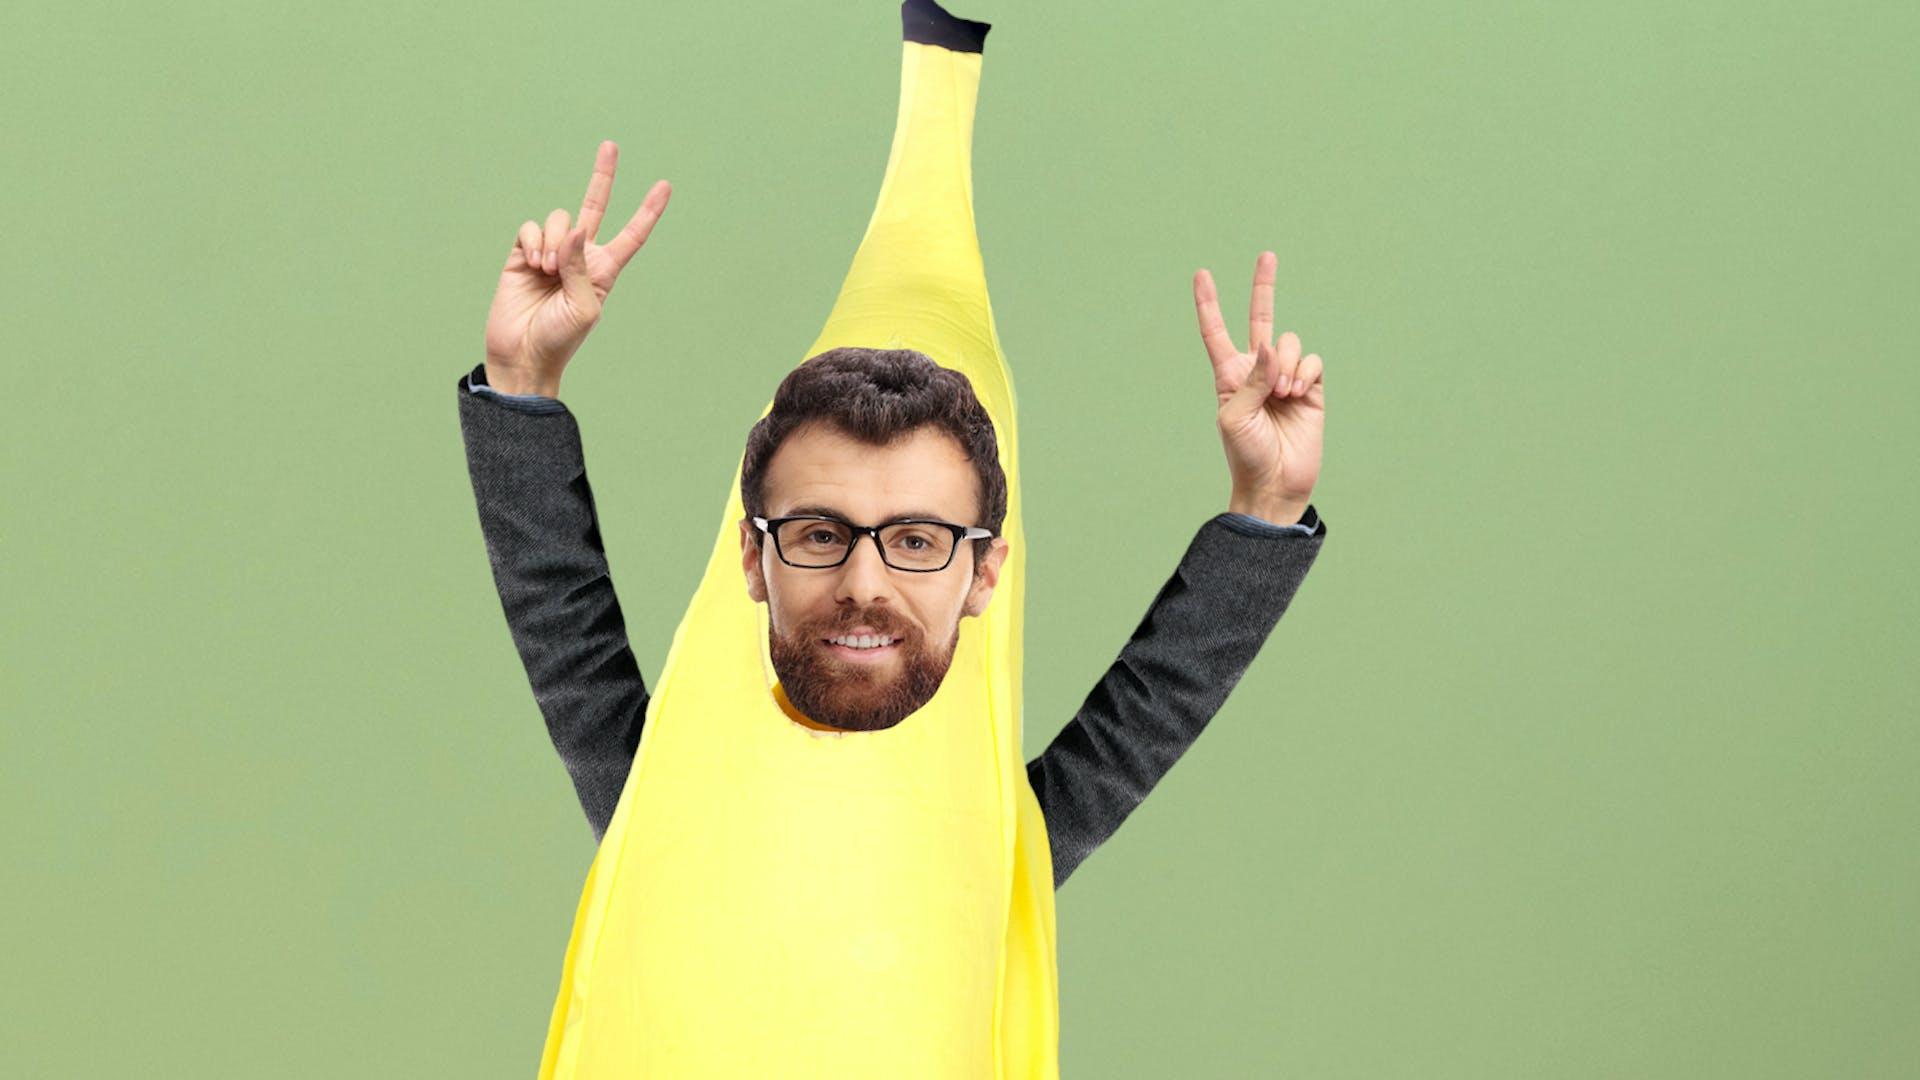 Geography teacher dressed as a banana